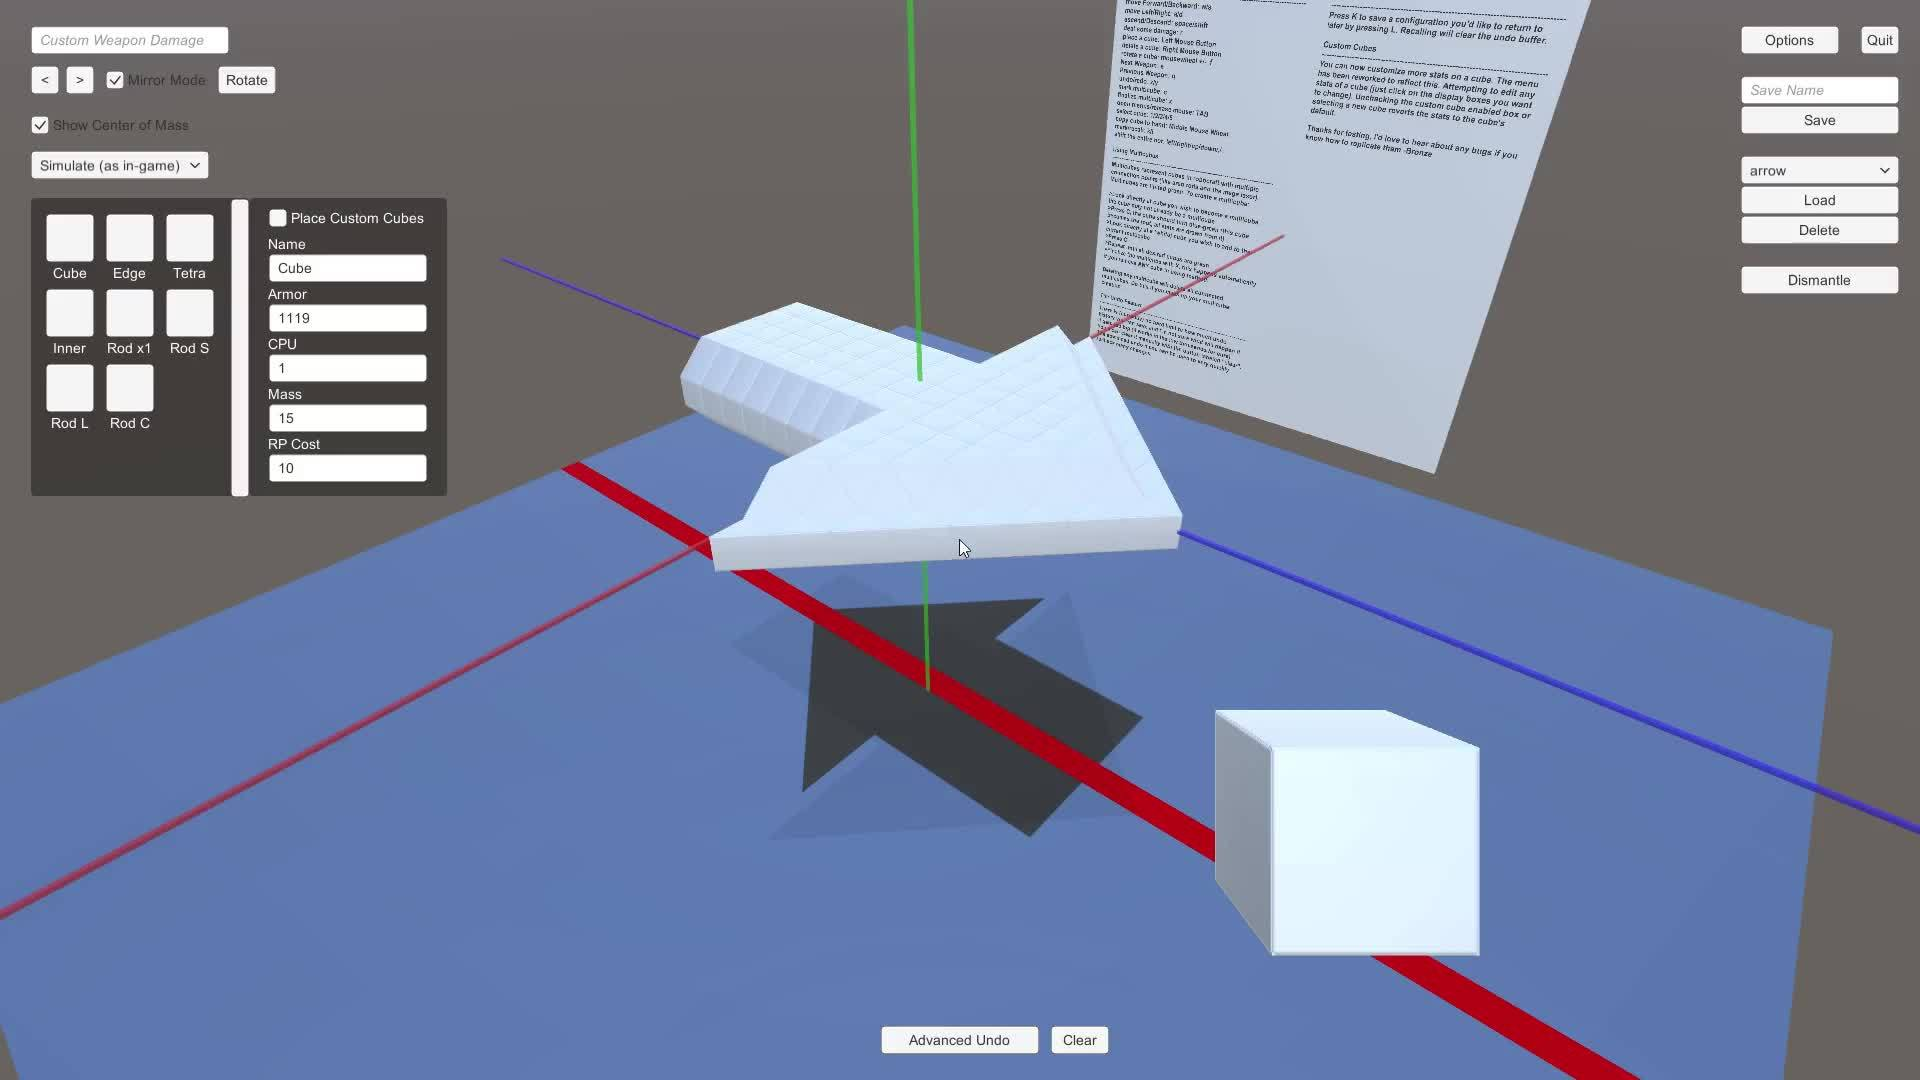 robocraft, Robocrash Rotate GIFs